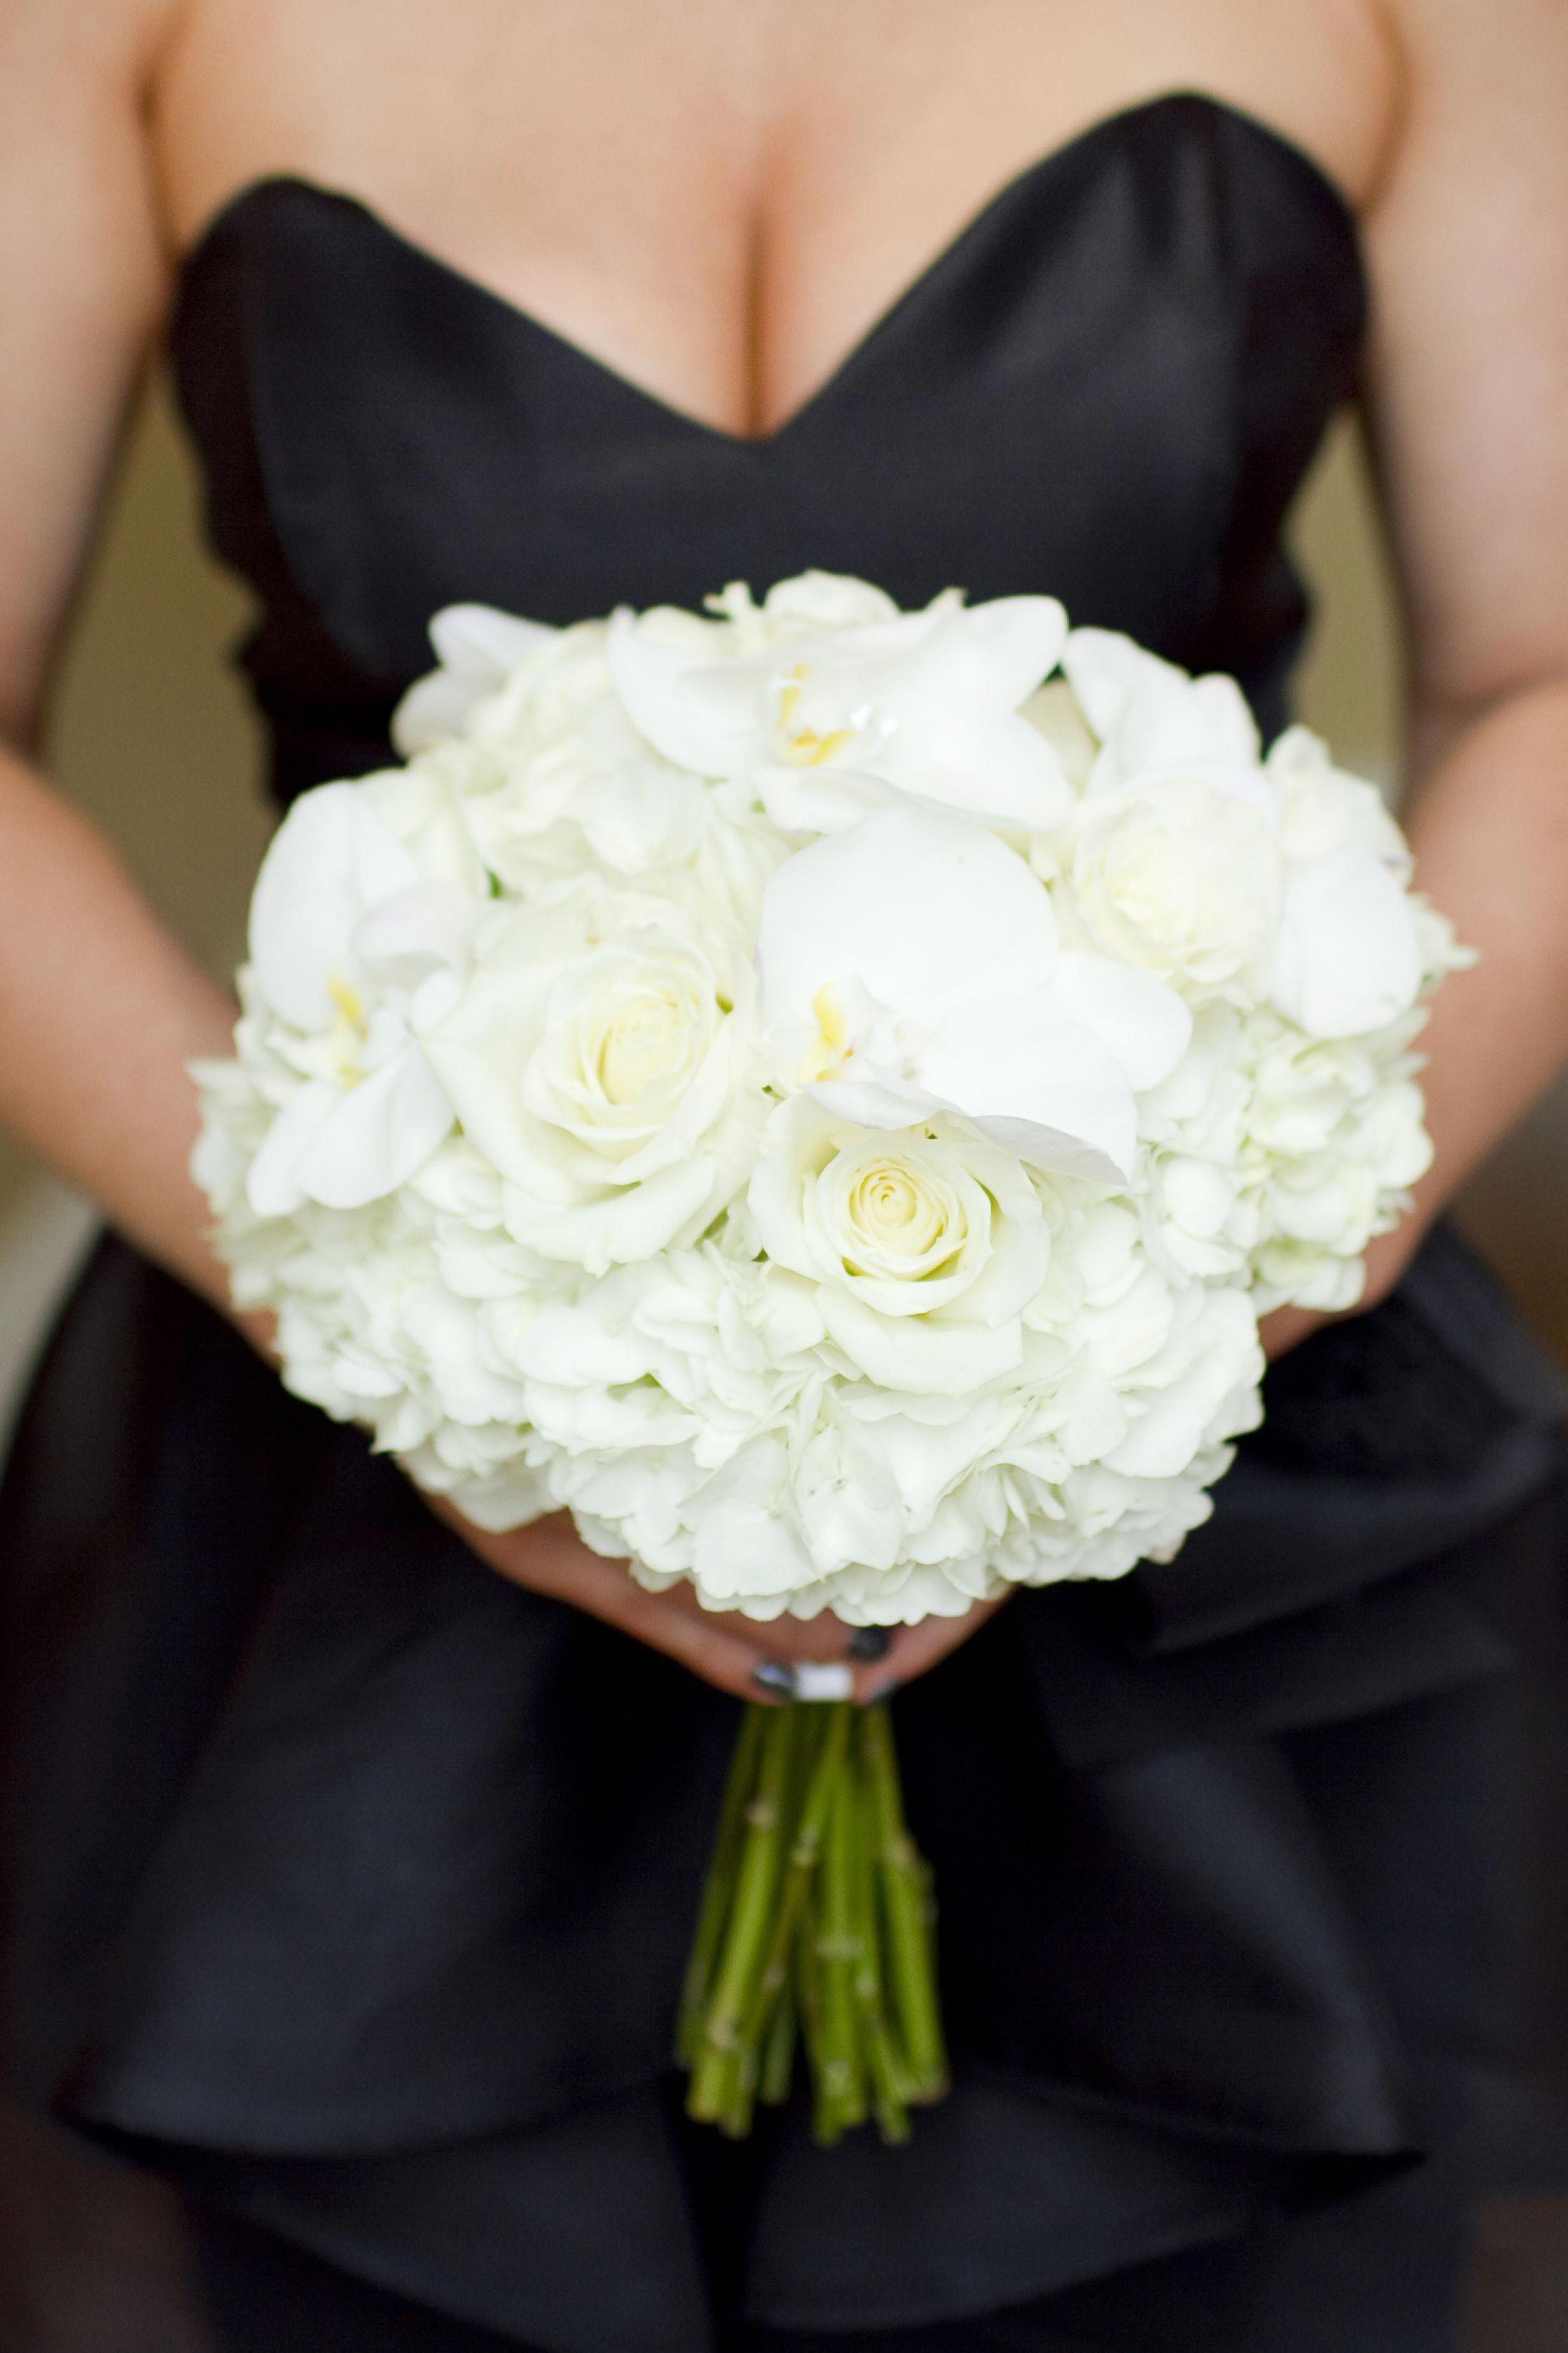 Bridesmaids floral lovely white bridesmaid bouquet